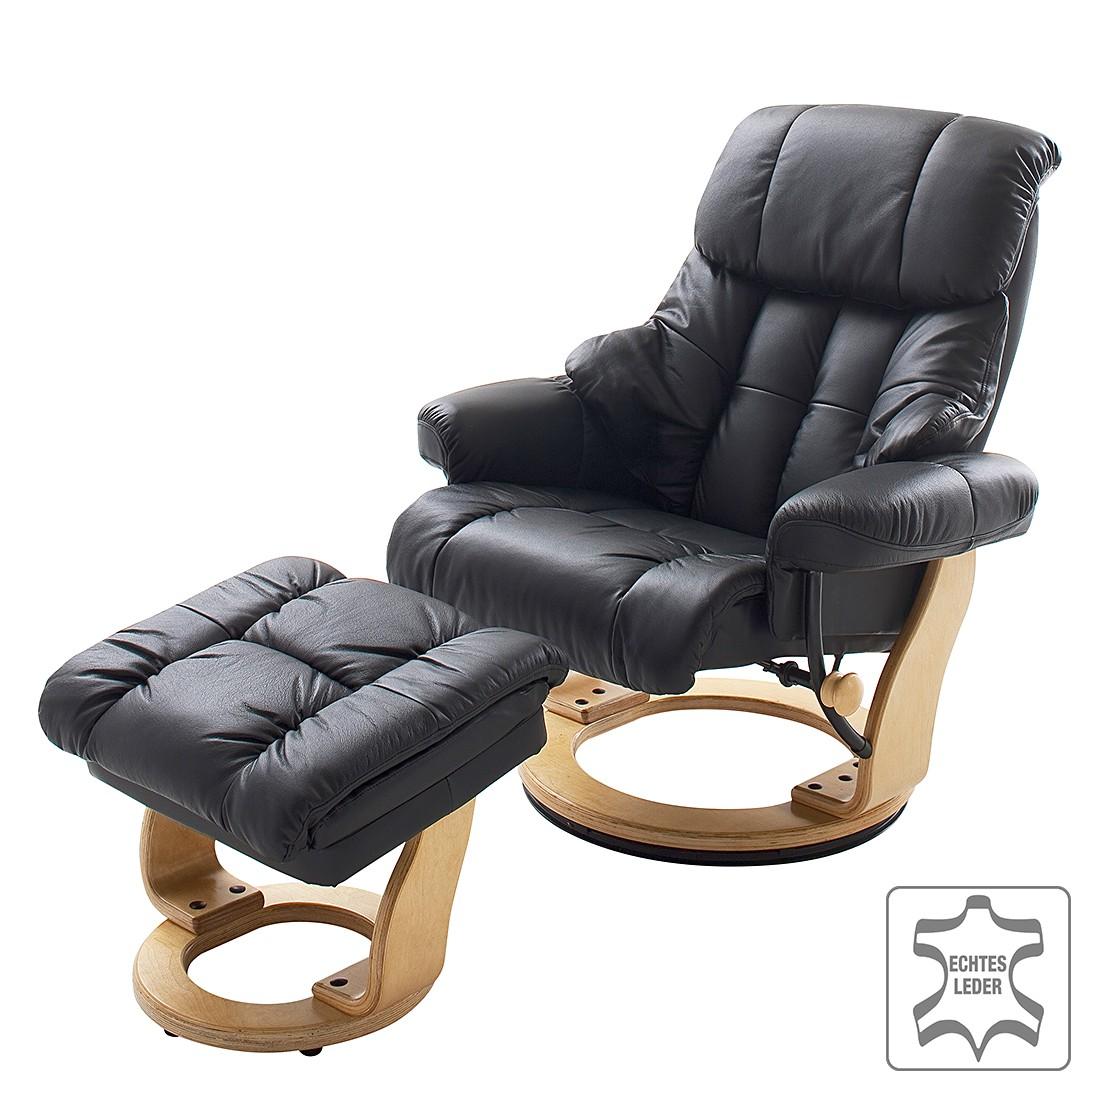 relaxsessel grunewald mit hocker echtleder schwarz ebay. Black Bedroom Furniture Sets. Home Design Ideas